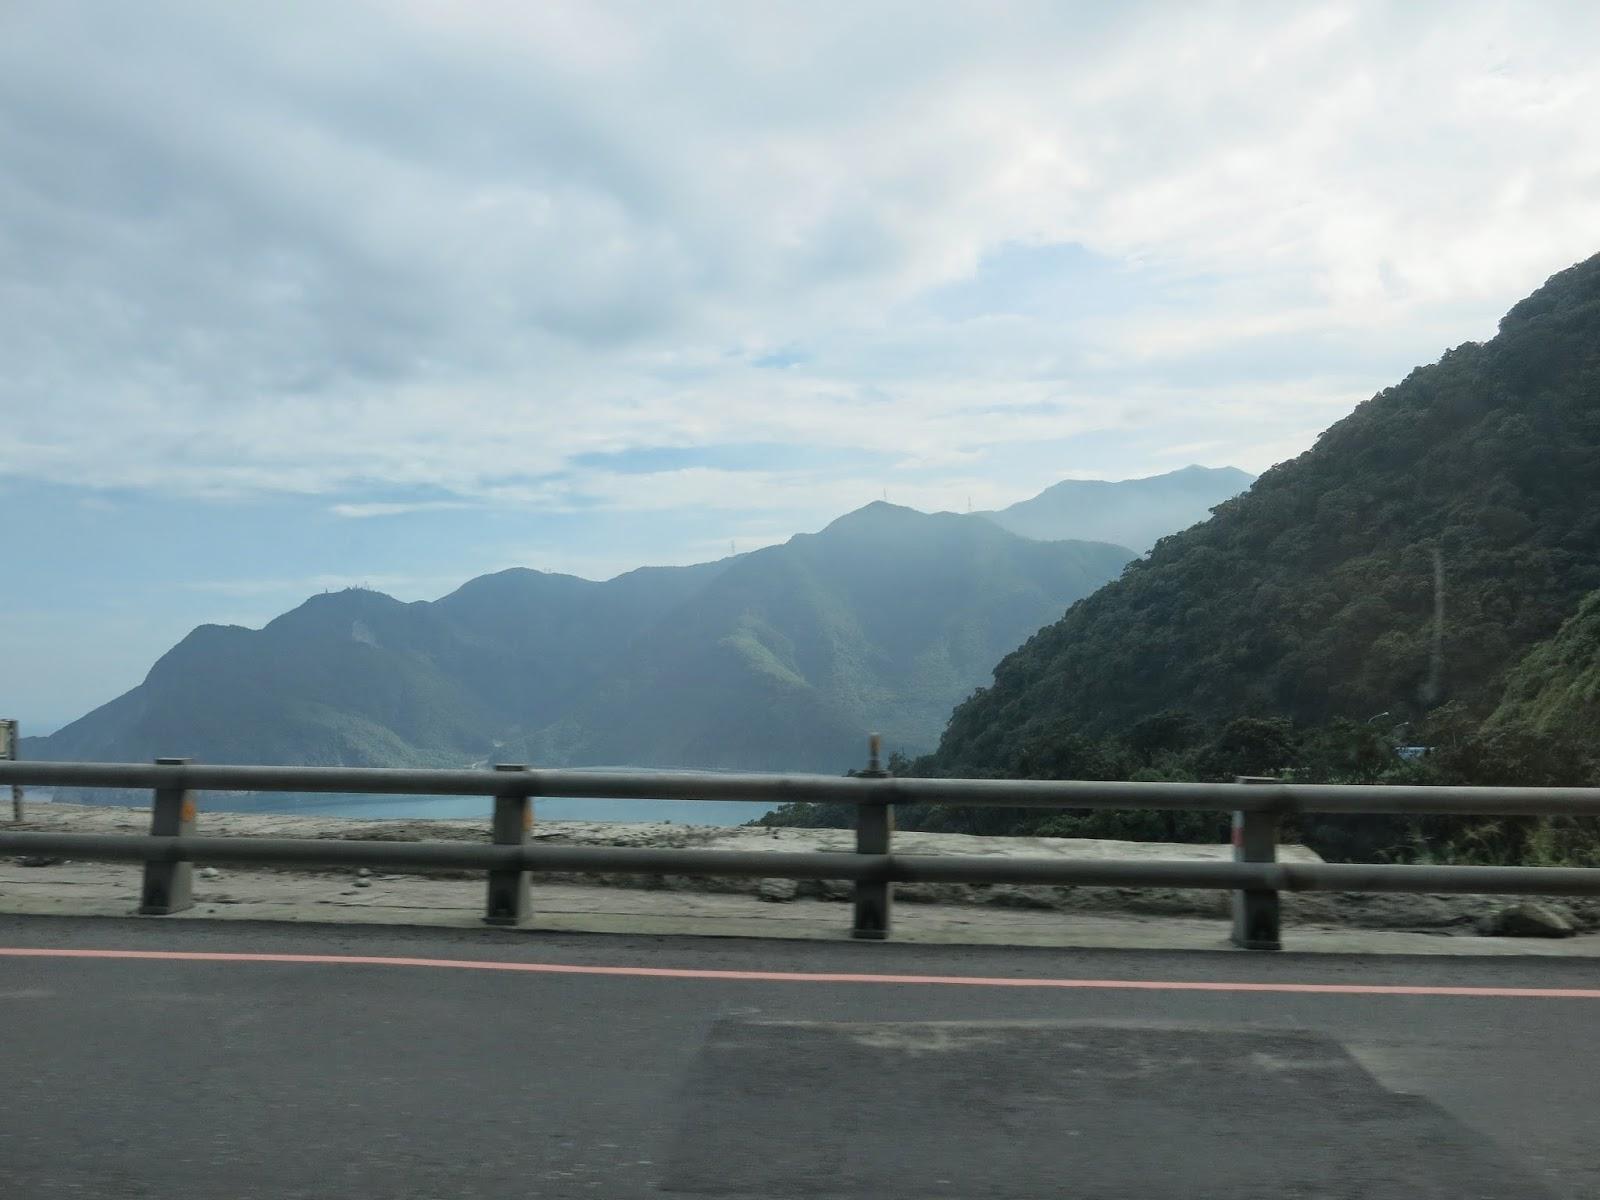 Yilan To Hualien: Suhua Highway 蘇花公路